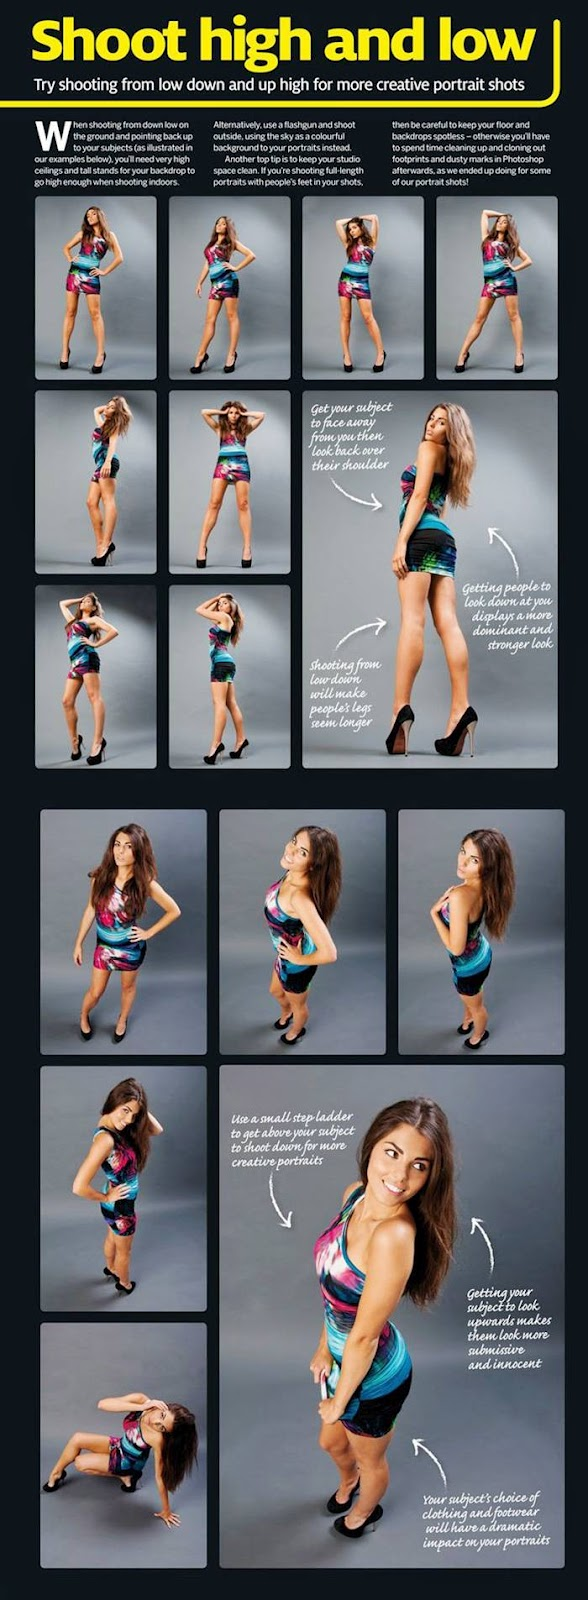 Best 50 Photoshoot Ideas Allin1informacionOutdoor Photoshoot Ideas For Models